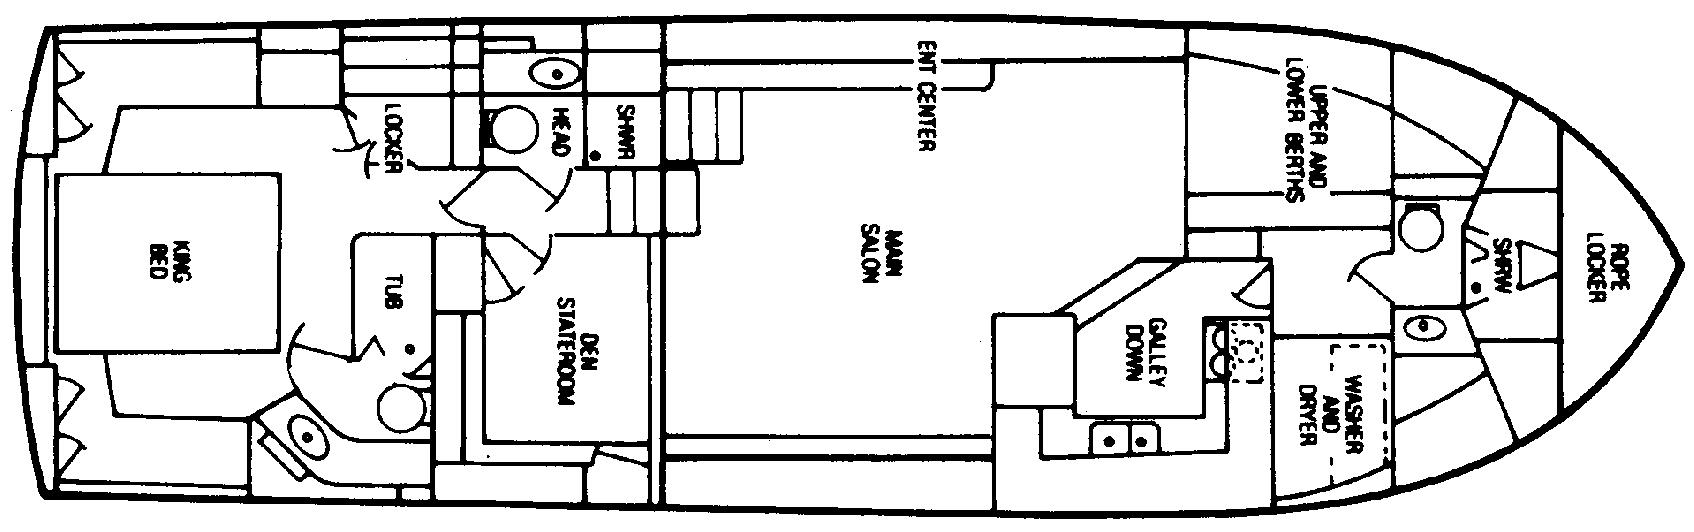 500 Constellation Motor Yacht Floor Plan 1